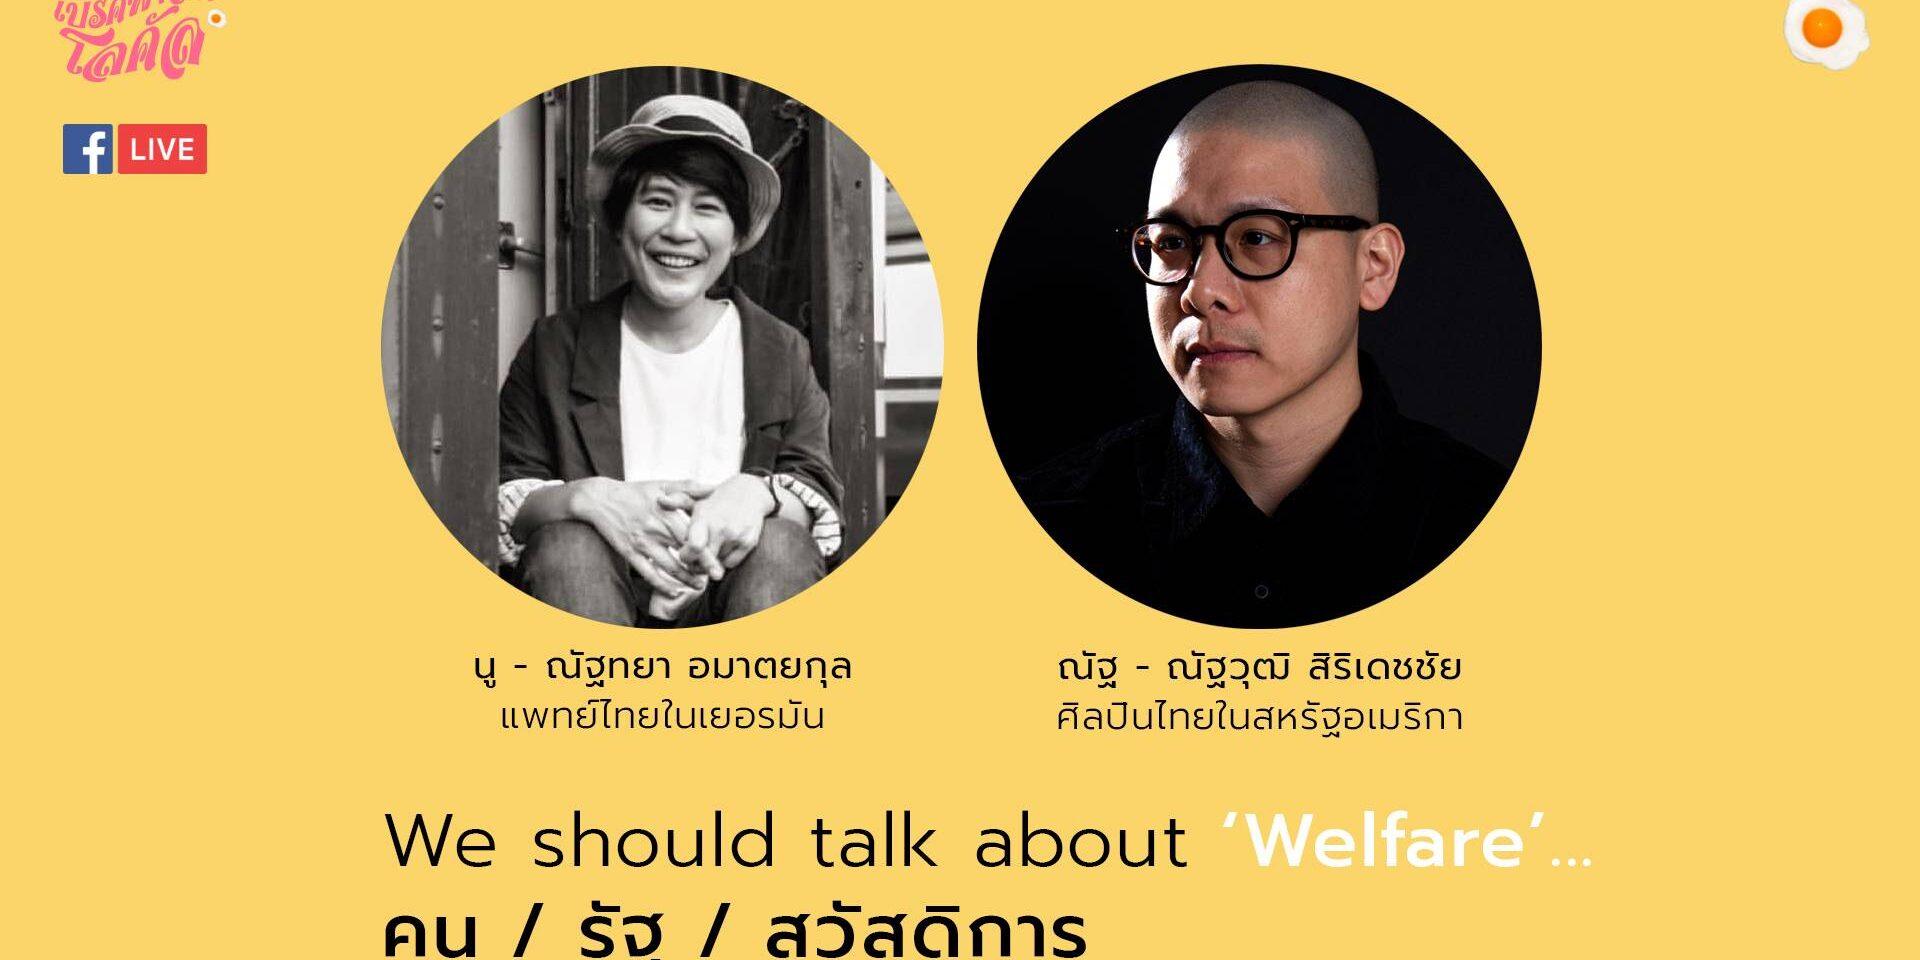 LIVE   We should talk about 'Welfare'... คน / รัฐ / สวัสดิการ